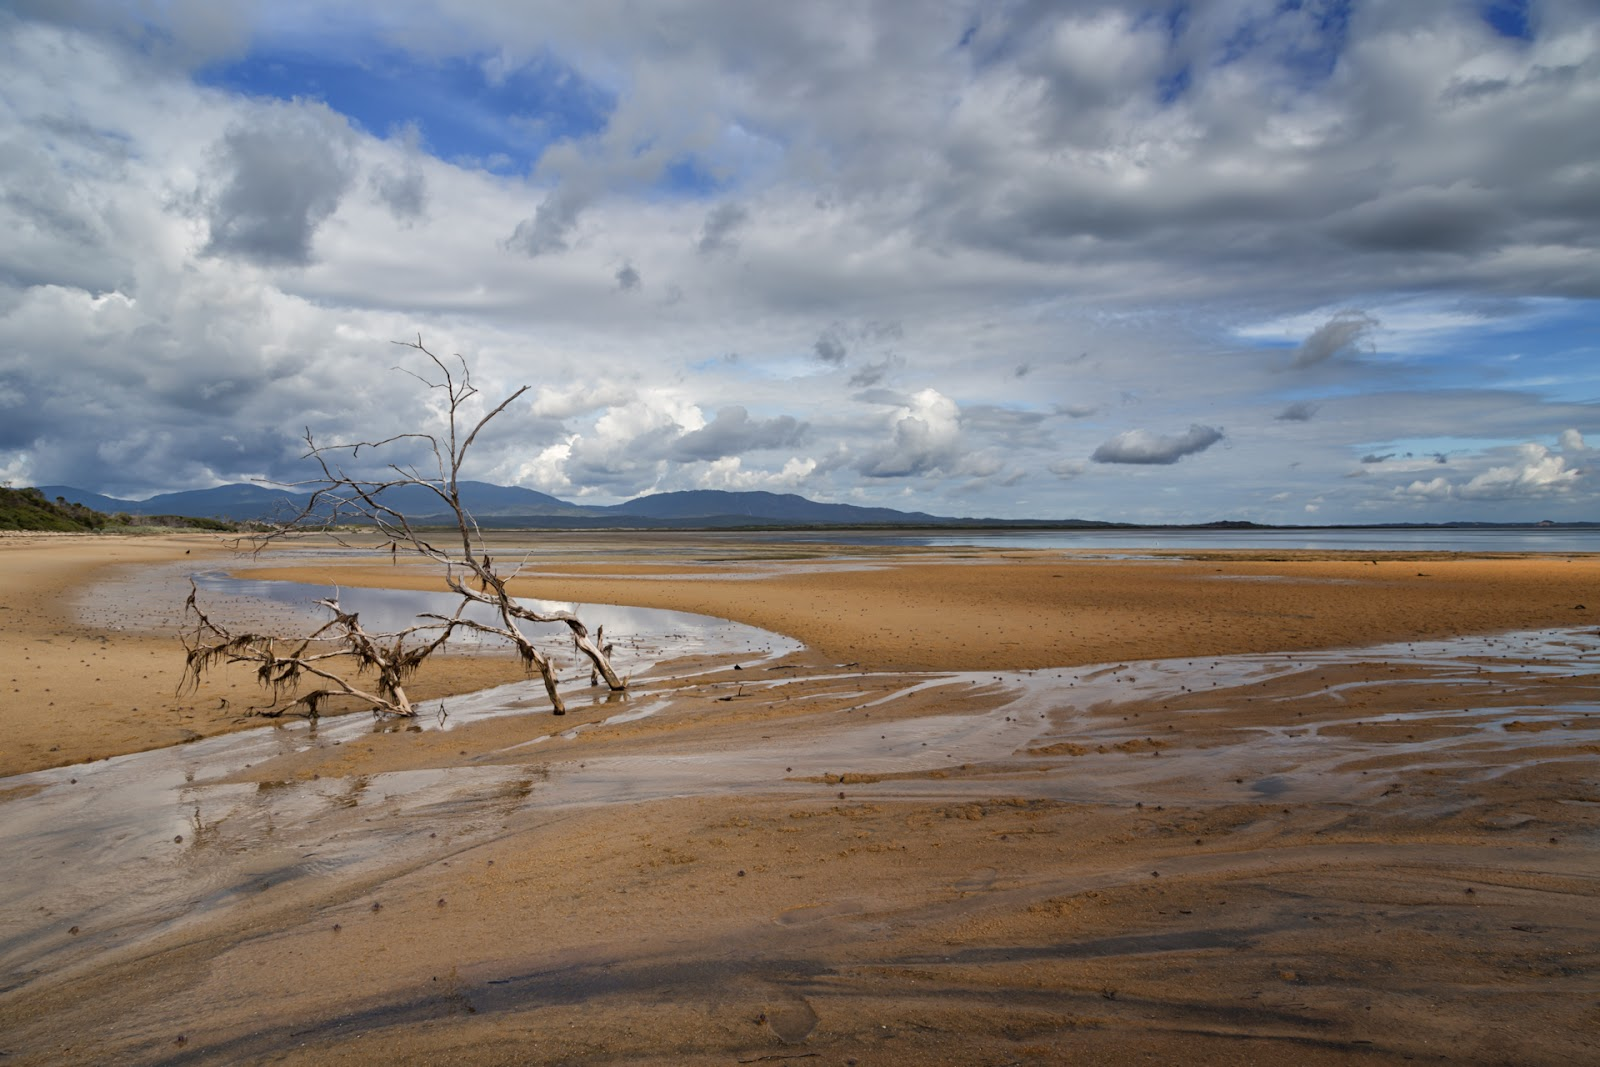 tree branches chinaman long beach wilsons promontory